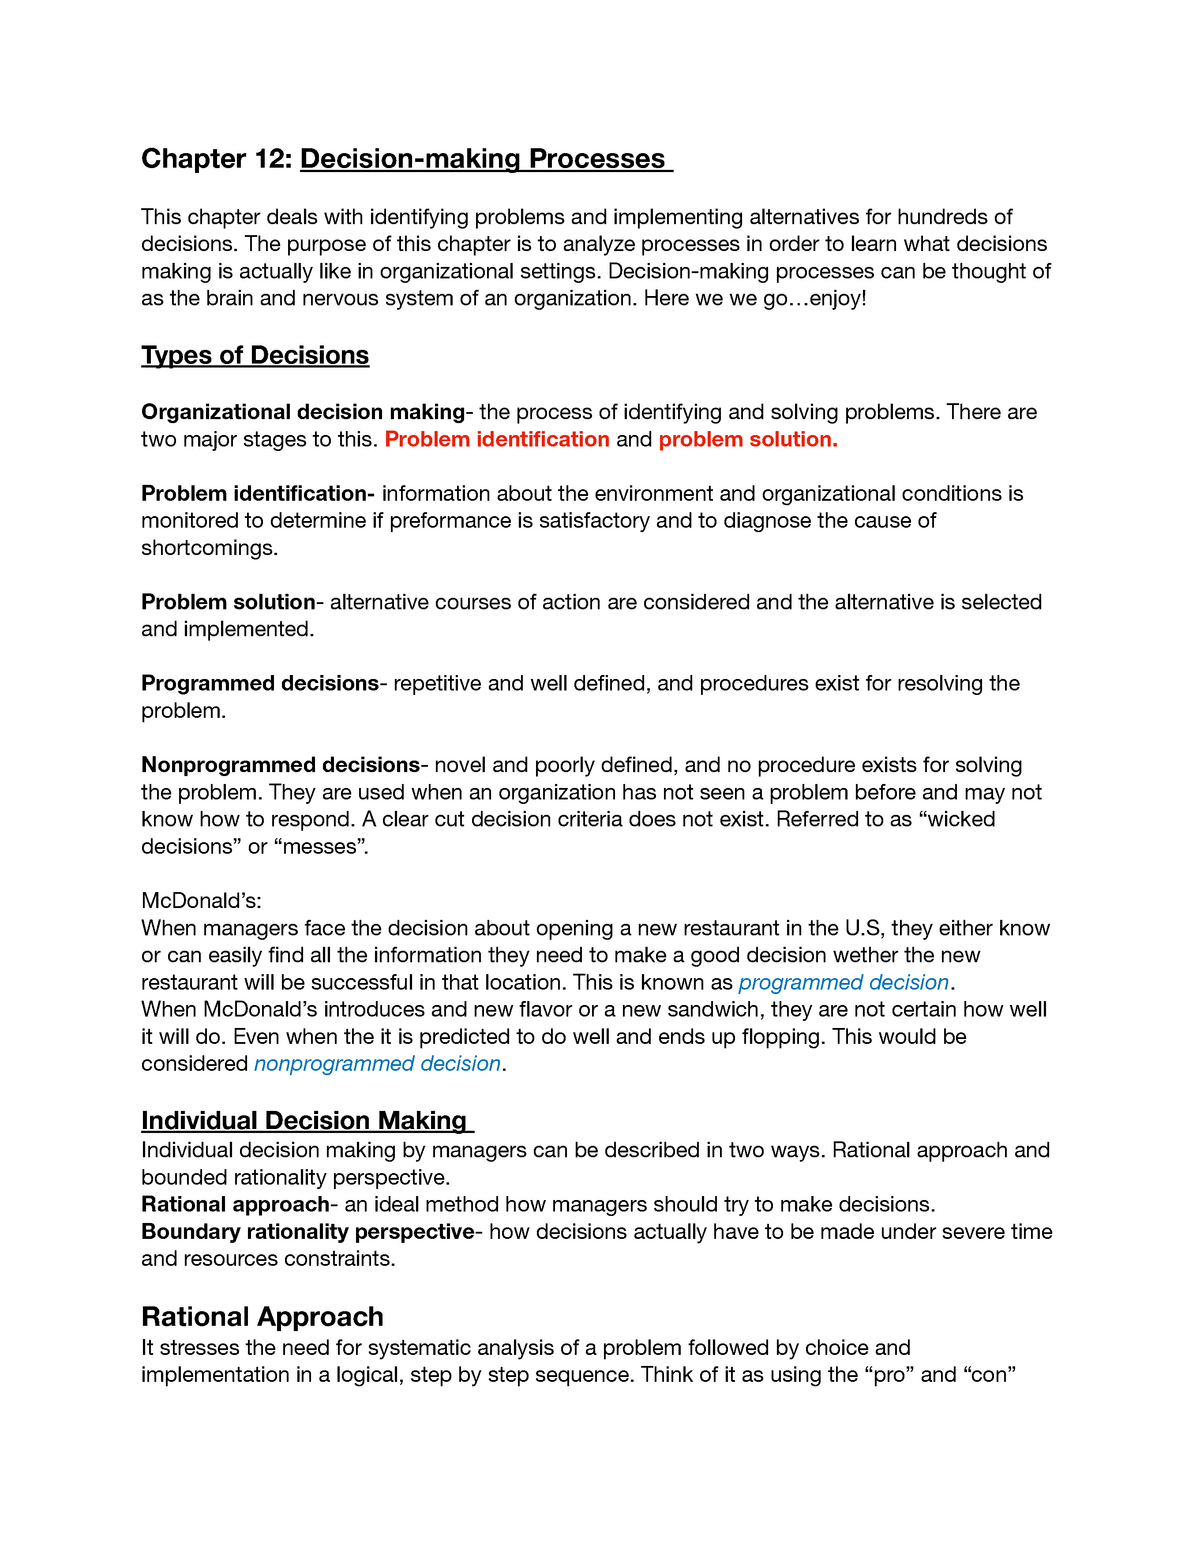 organizational analysis deals with identifying